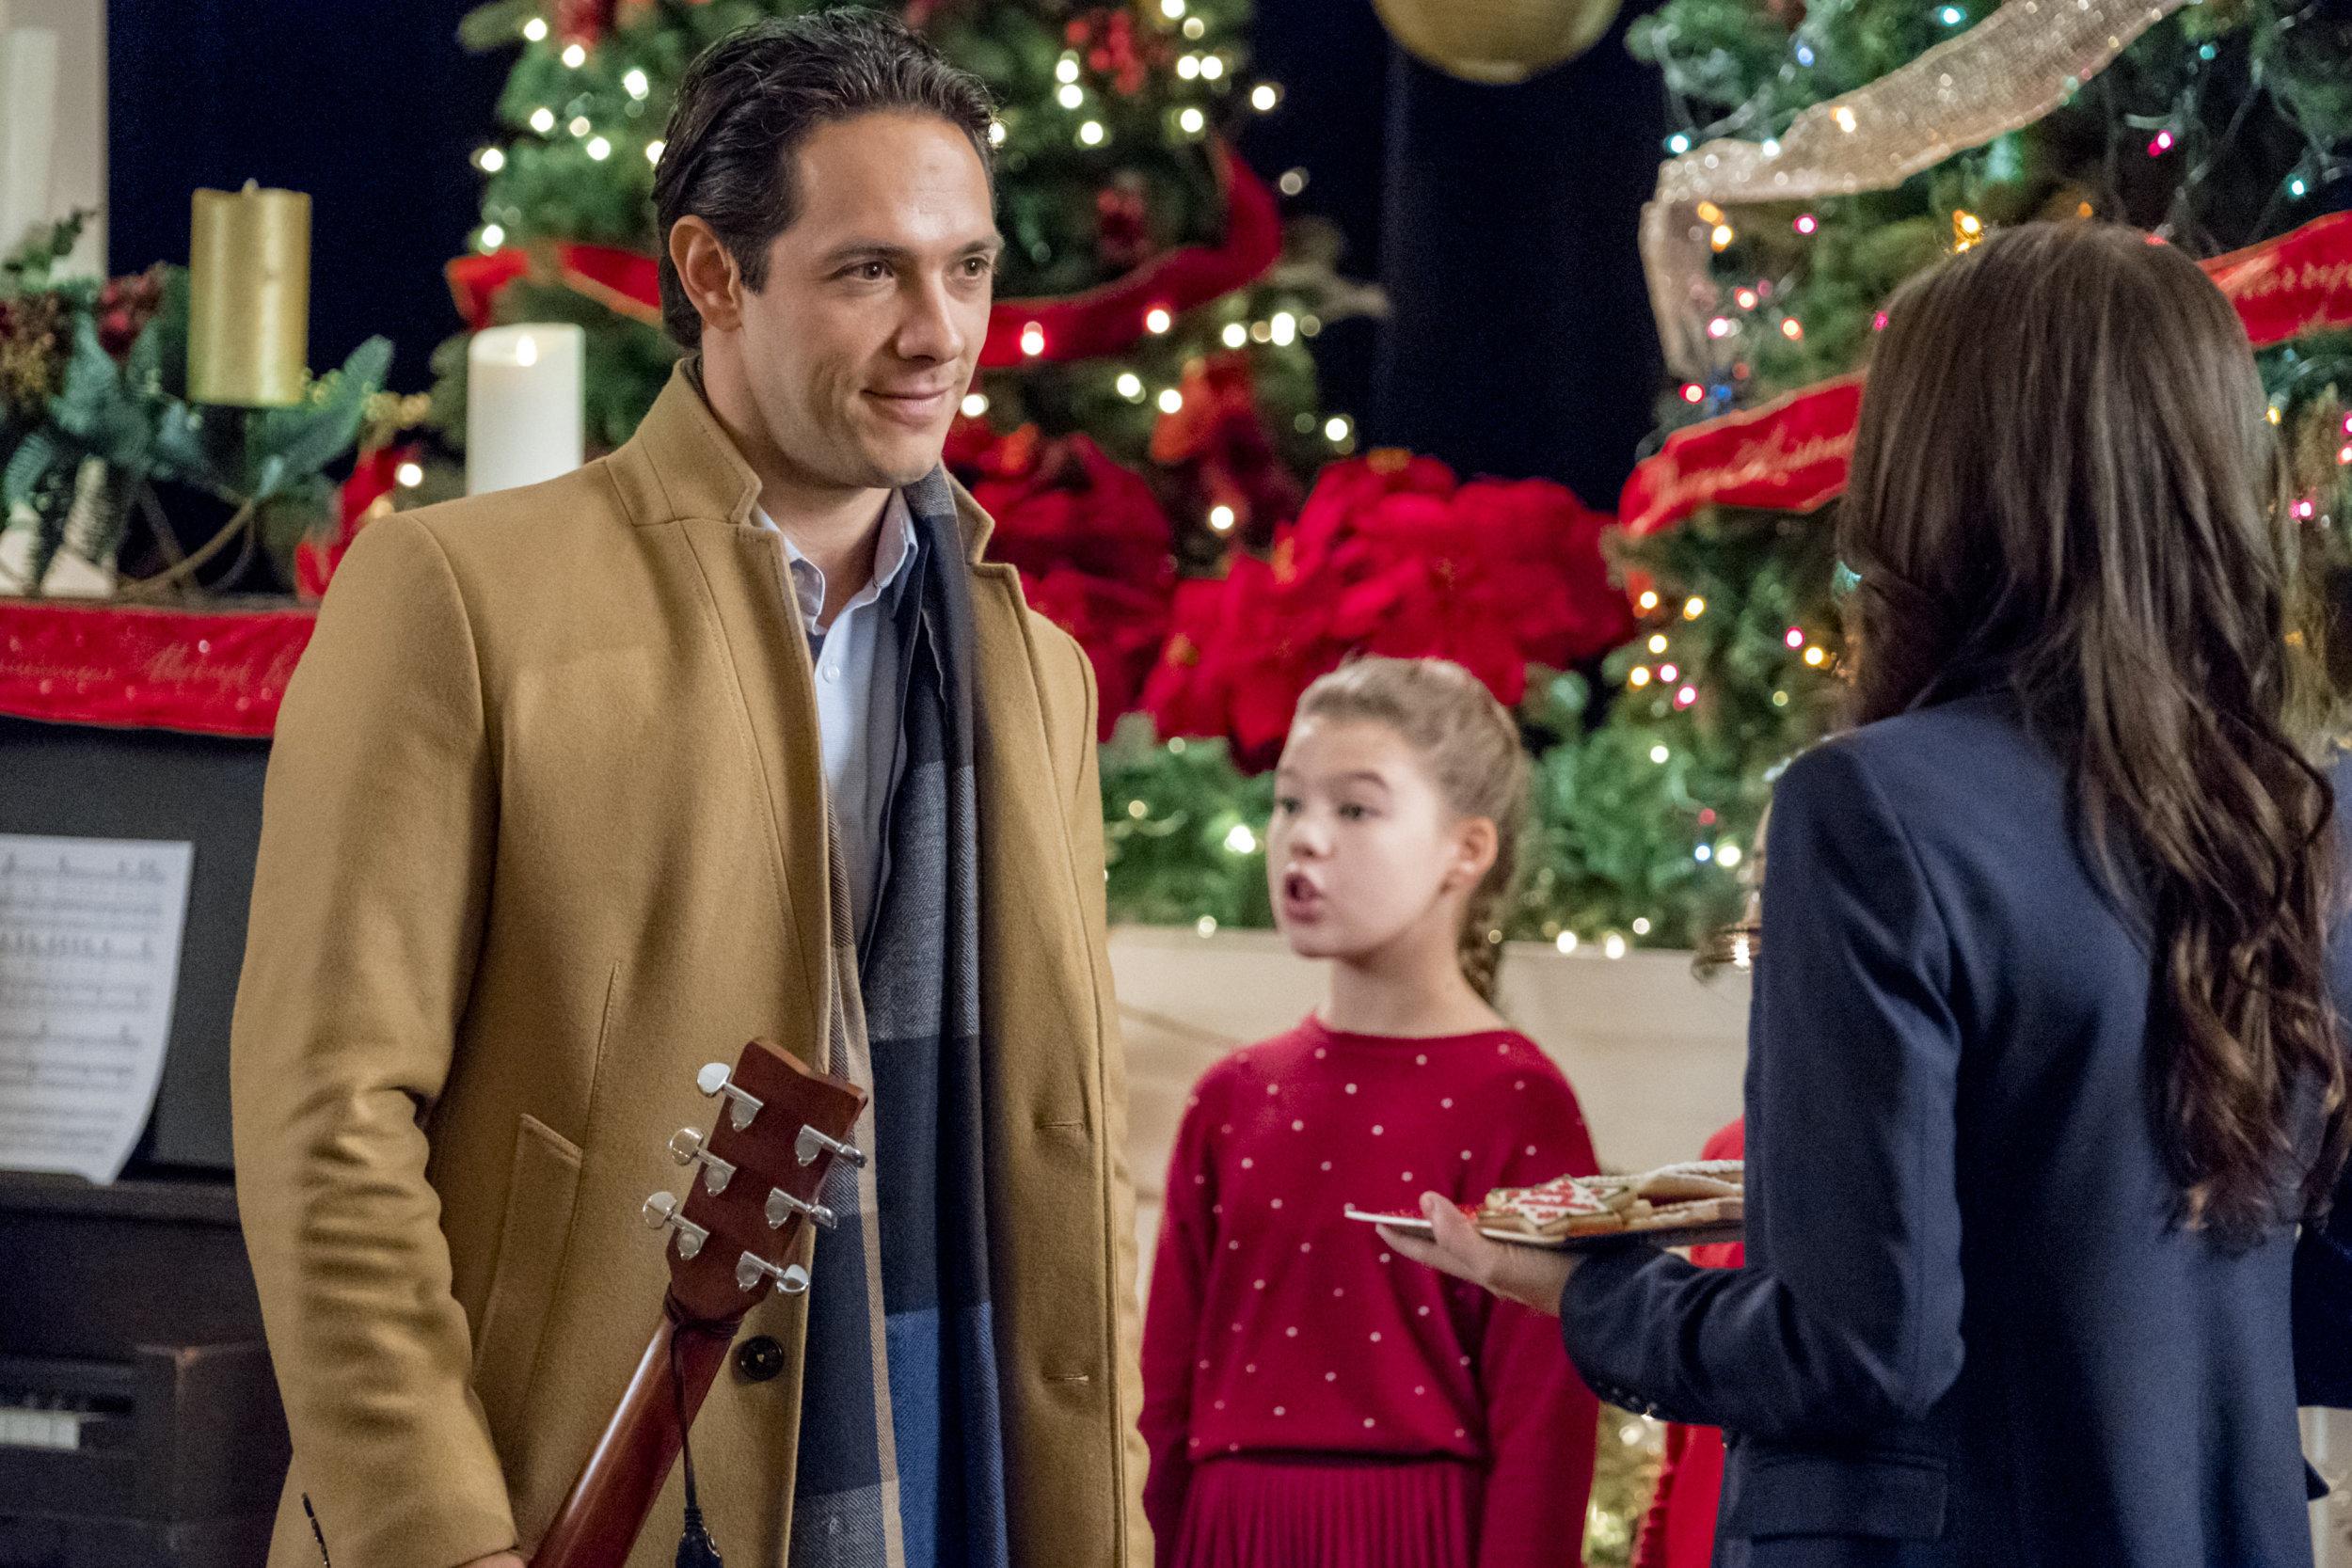 On Location - A Joyous Christmas | Hallmark Movies and Mysteries